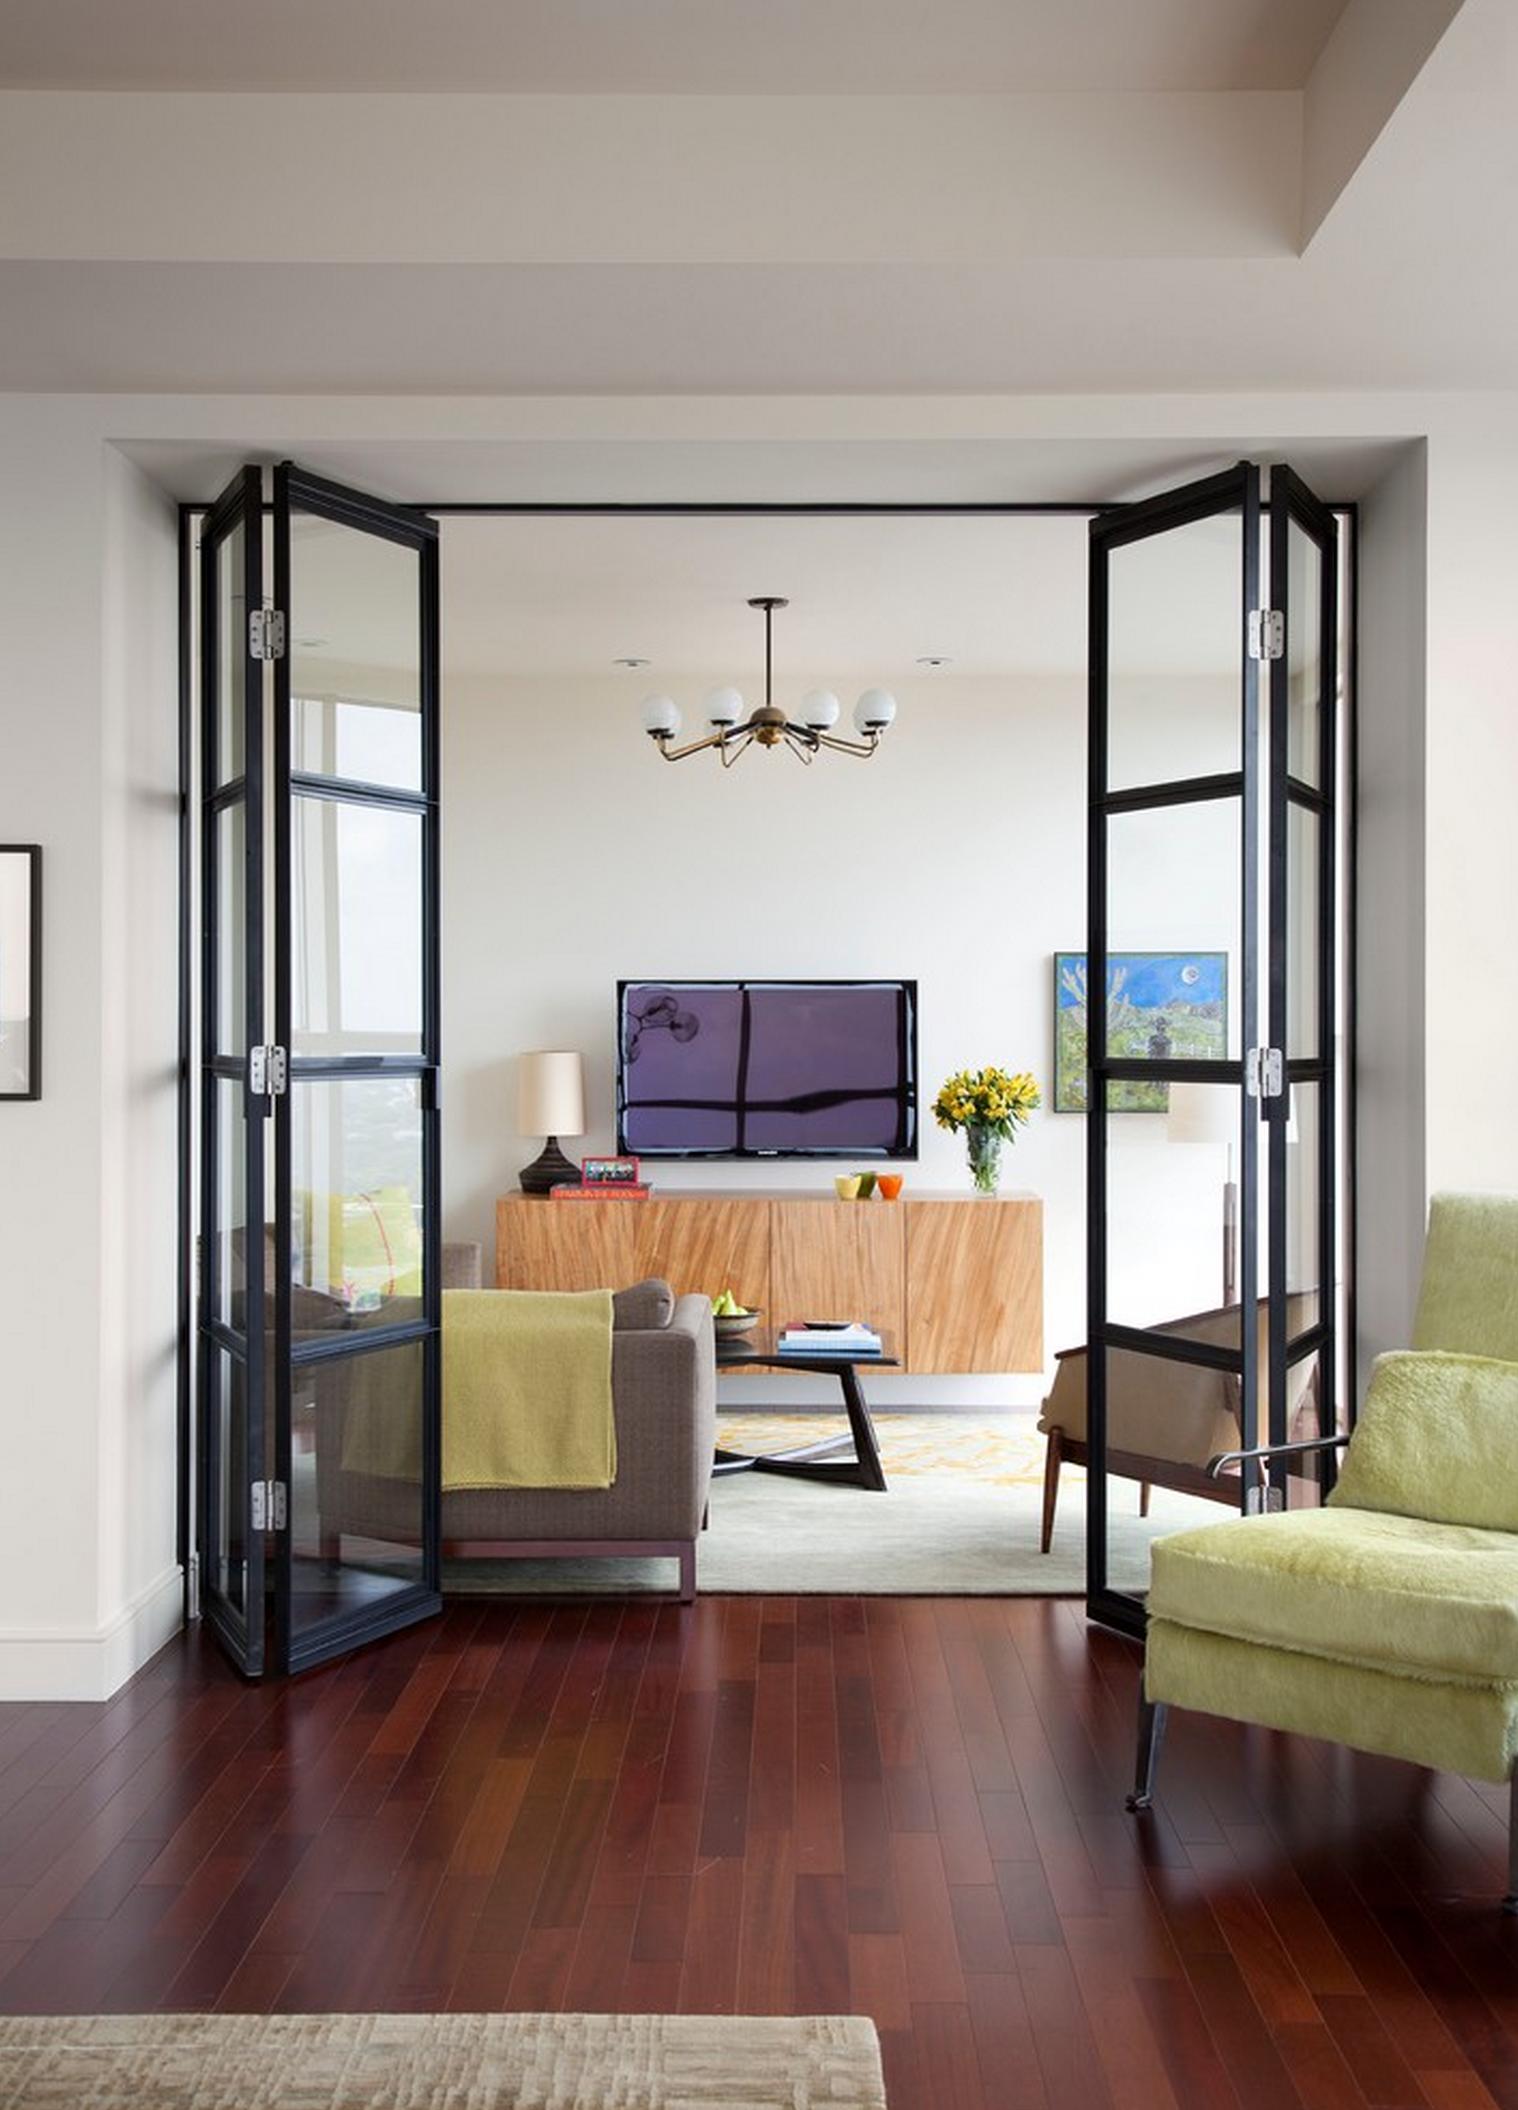 Interior Designed Living Rooms Cool Living Room Design  Living Room  Pinterest  Living Rooms Room Design Decoration